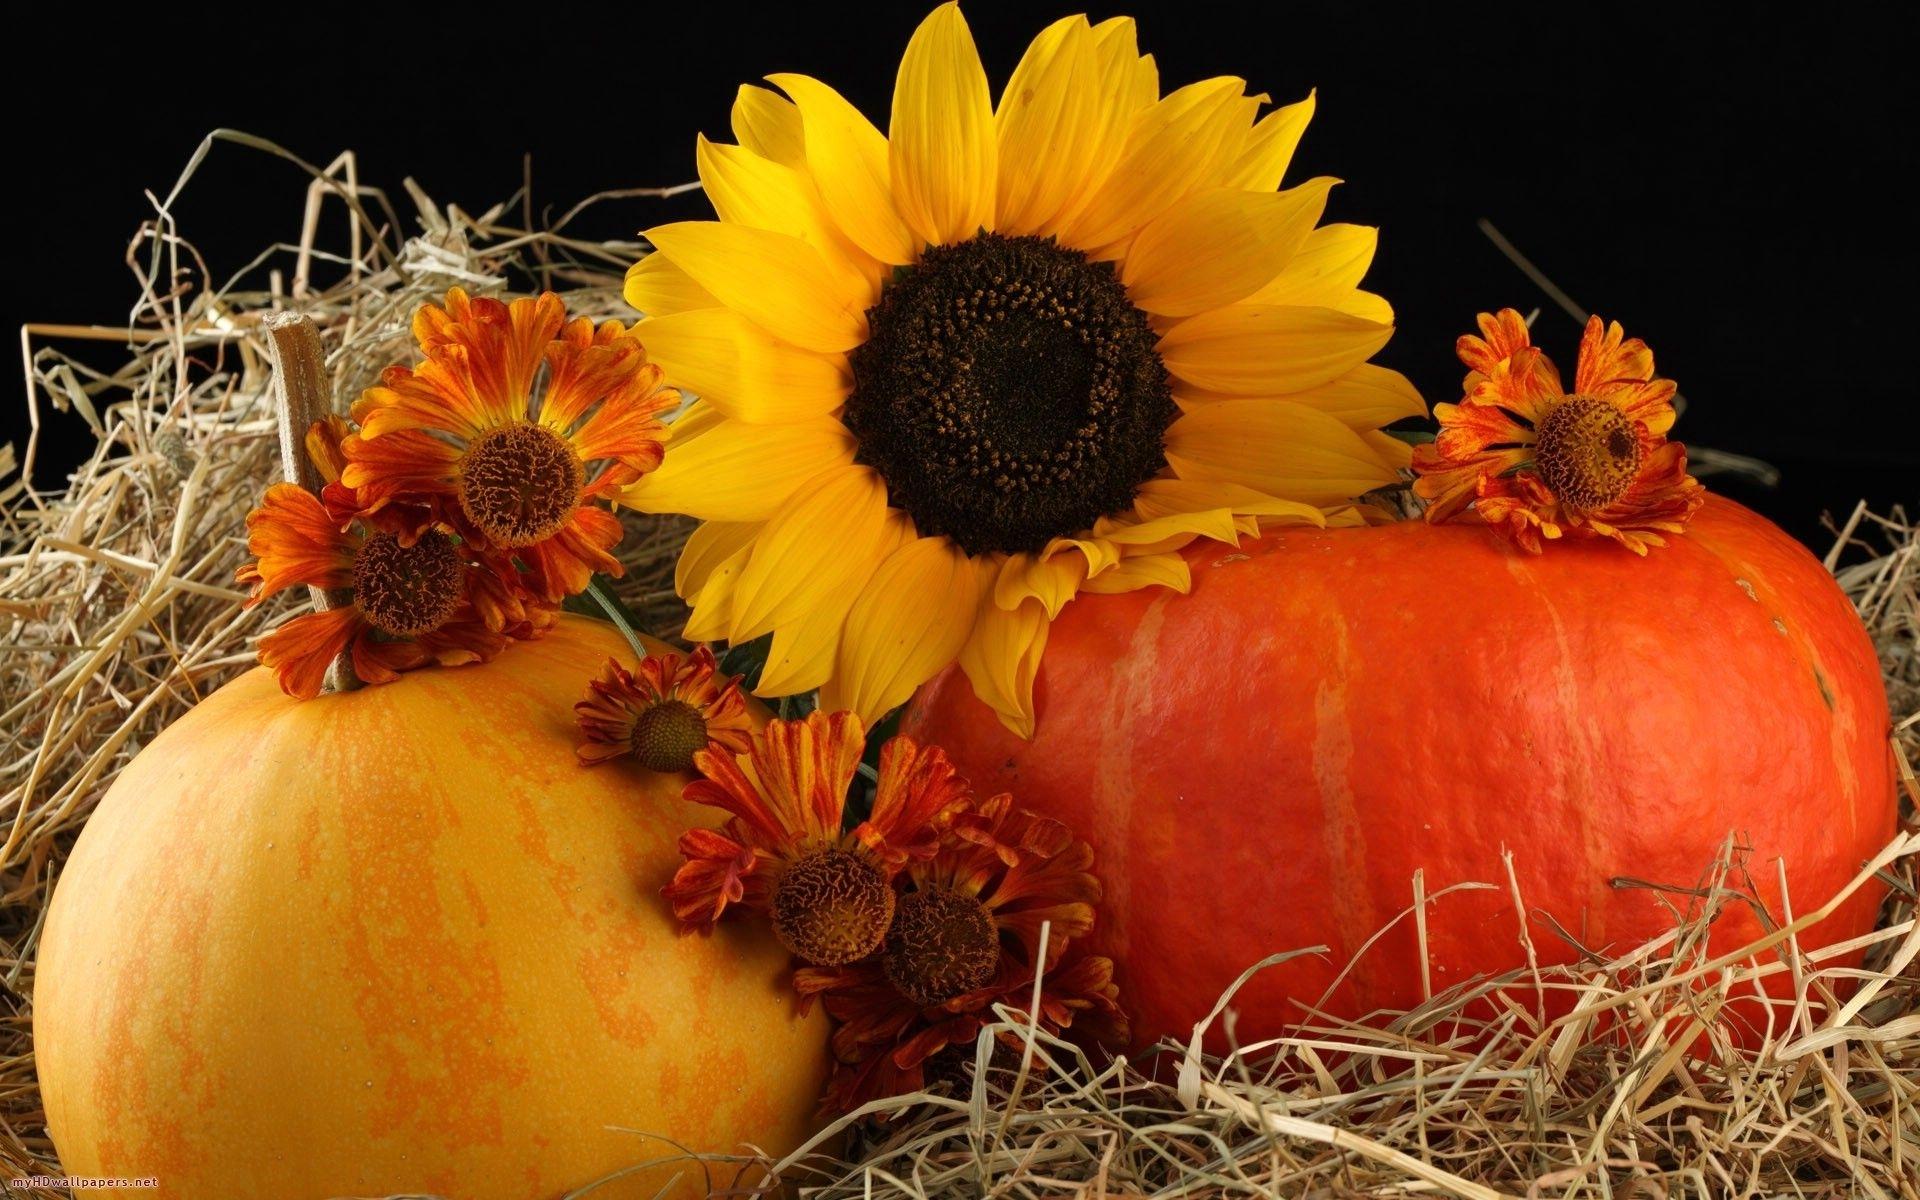 free sunflower desktop wallpaper, hd wallpapers download and new